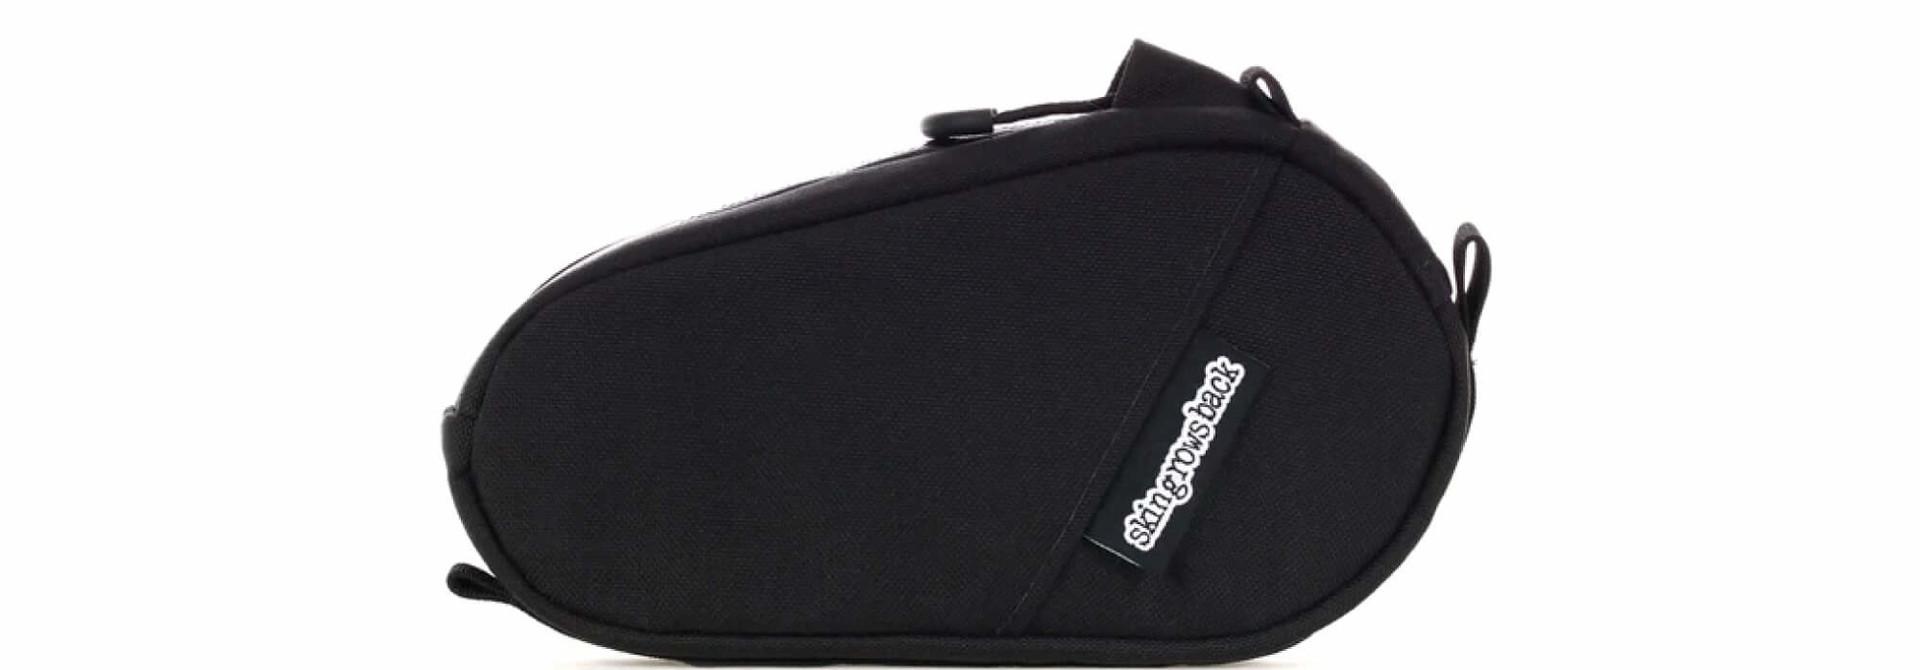 Amigo Top Tube Bag Black